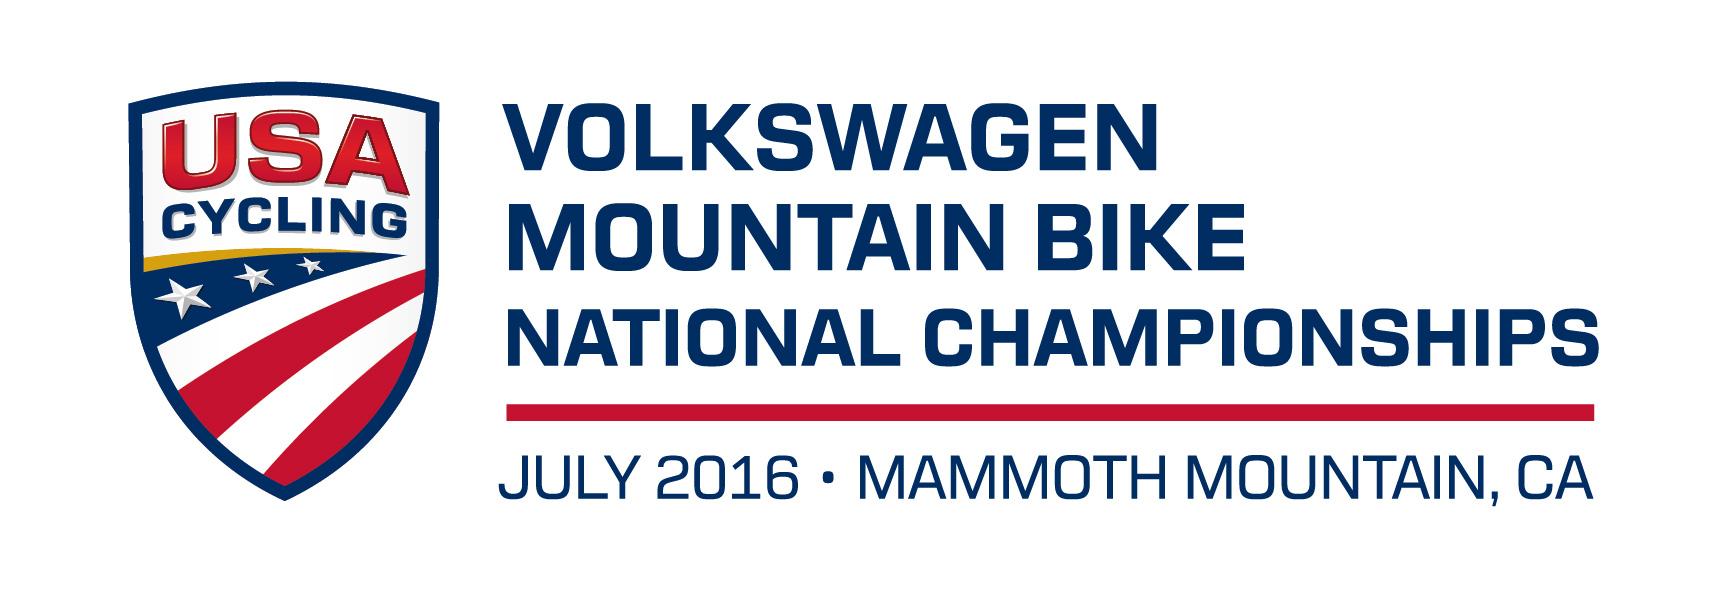 my race|result : : USA Cycling XC Mountain Bike National